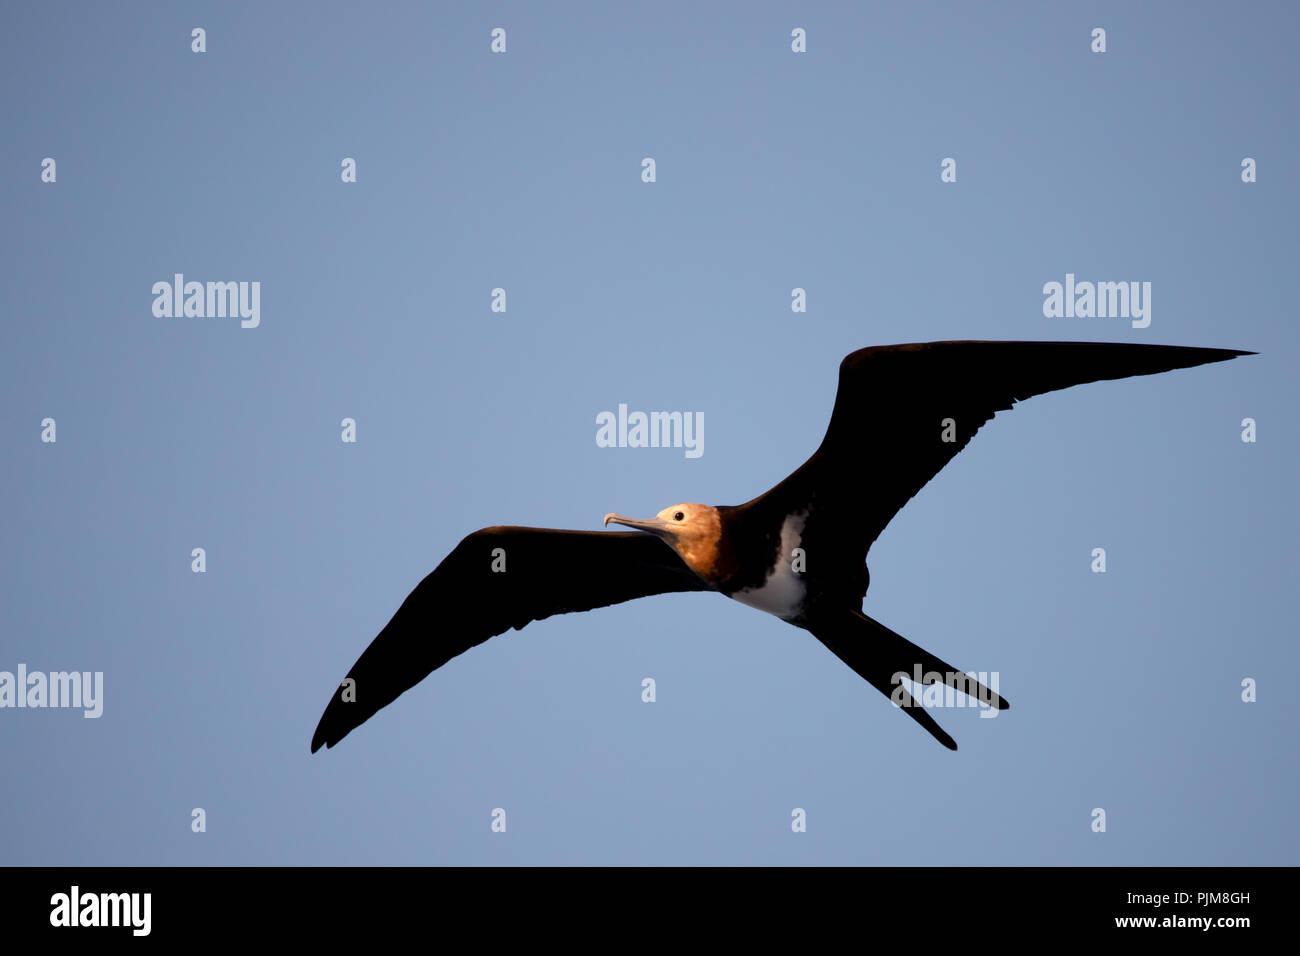 A juvenile frigatebird flying above Millennium atoll in the southern Line Islands of Kiribati. - Stock Image